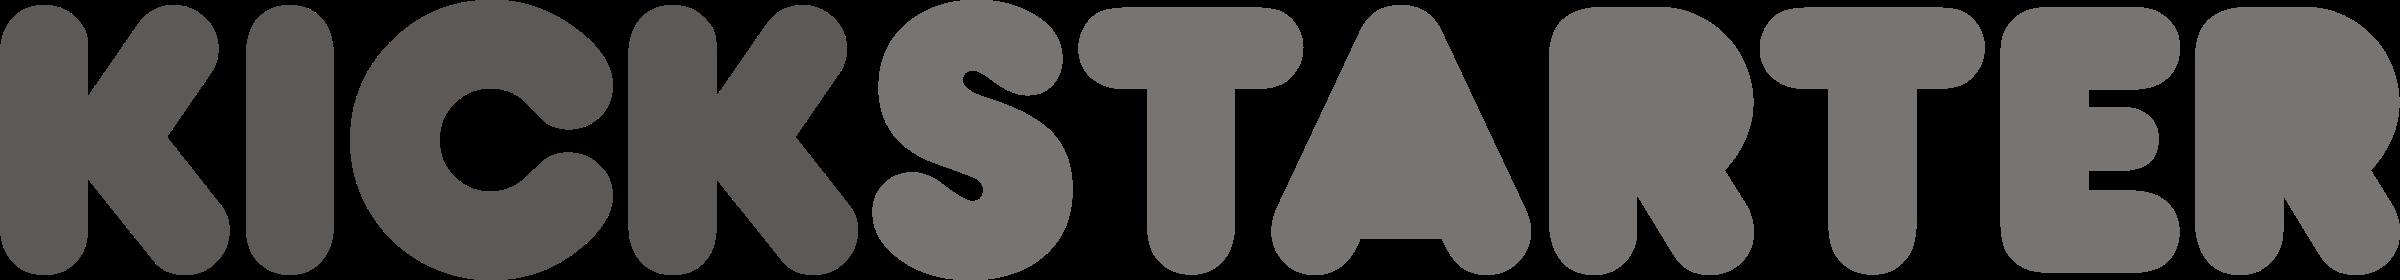 Kickstarter grey Logo PNG Transparent & SVG Vector ...